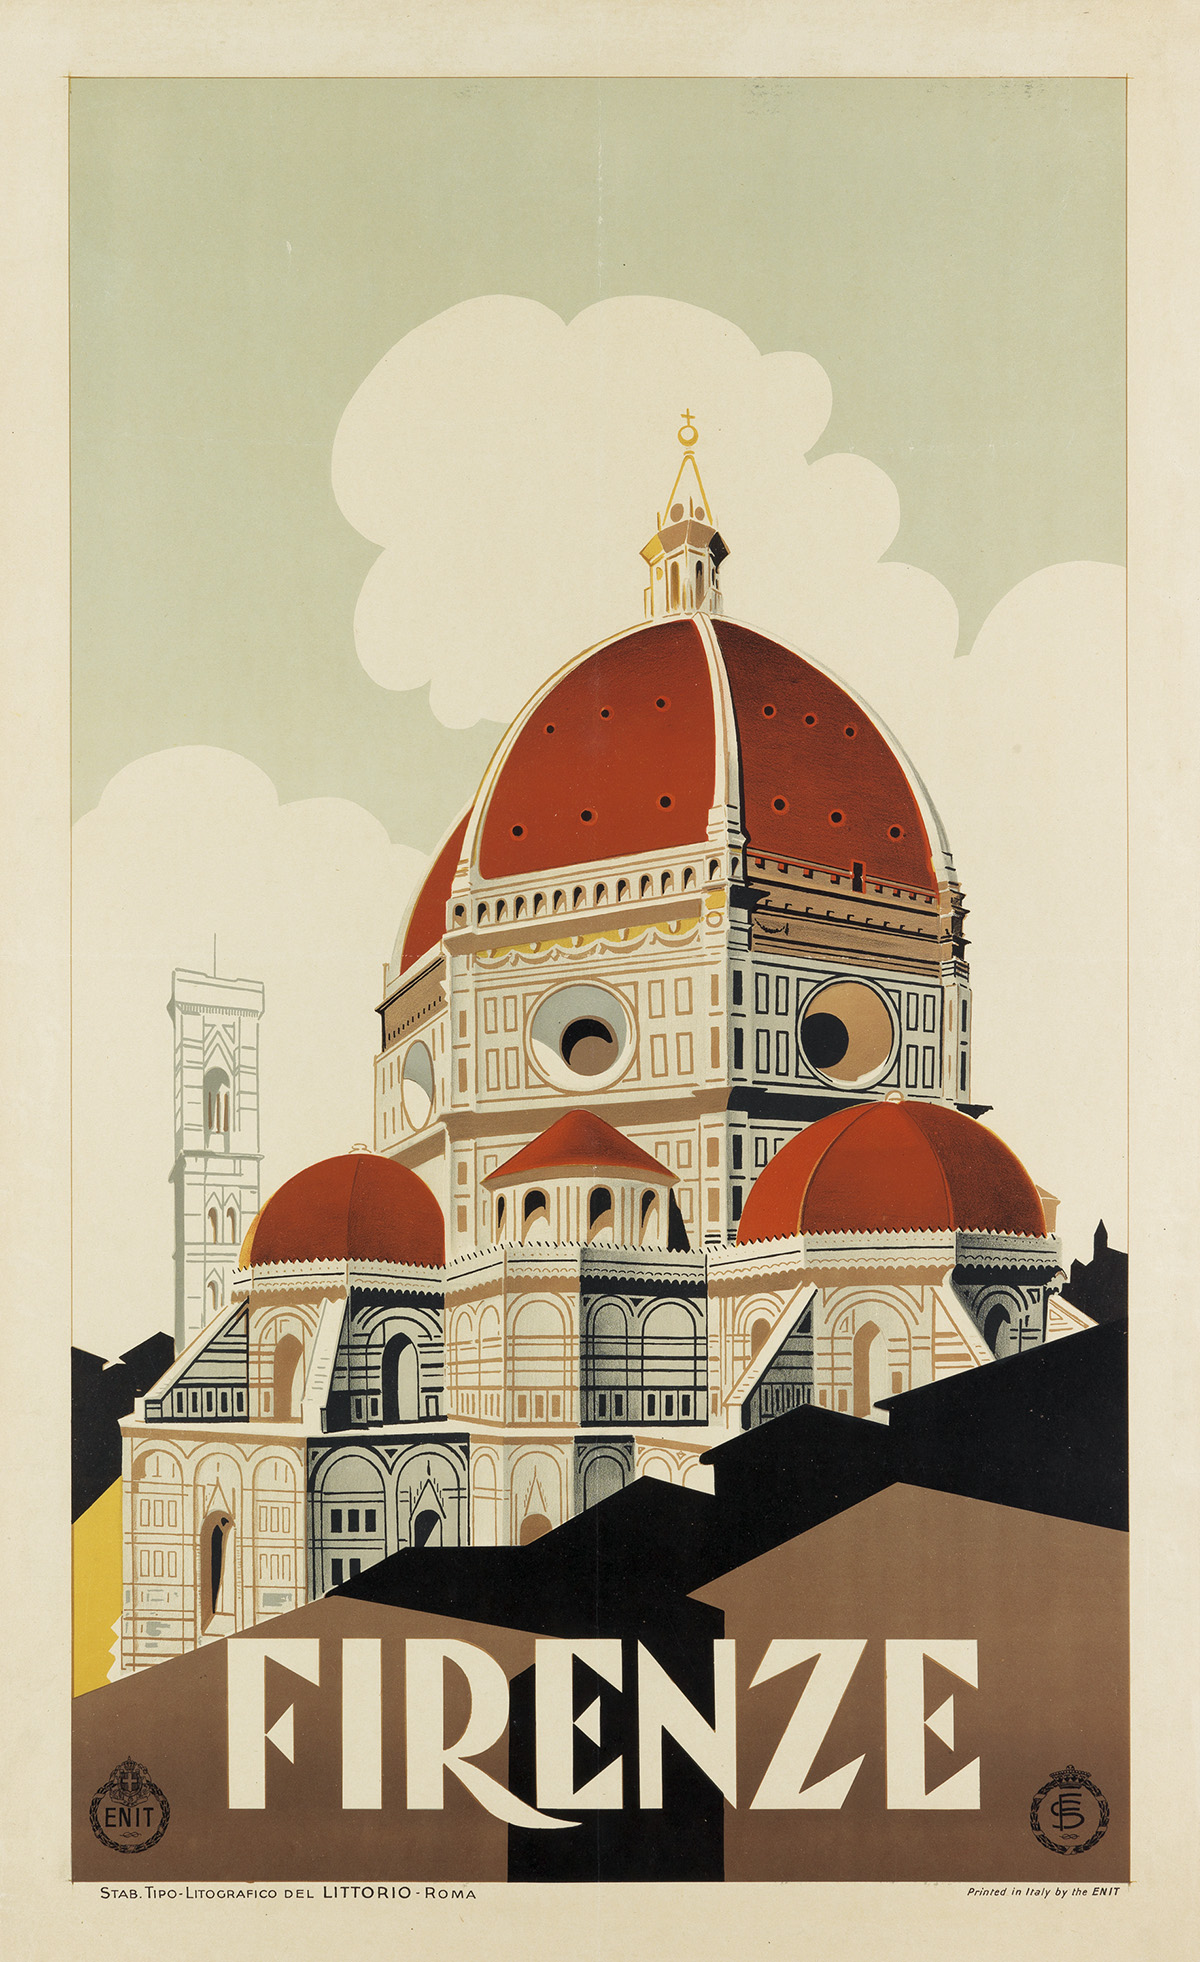 DESIGNER-UNKNOWN-FIRENZE-Circa-1930-39x24-inches-100x61-cm-L